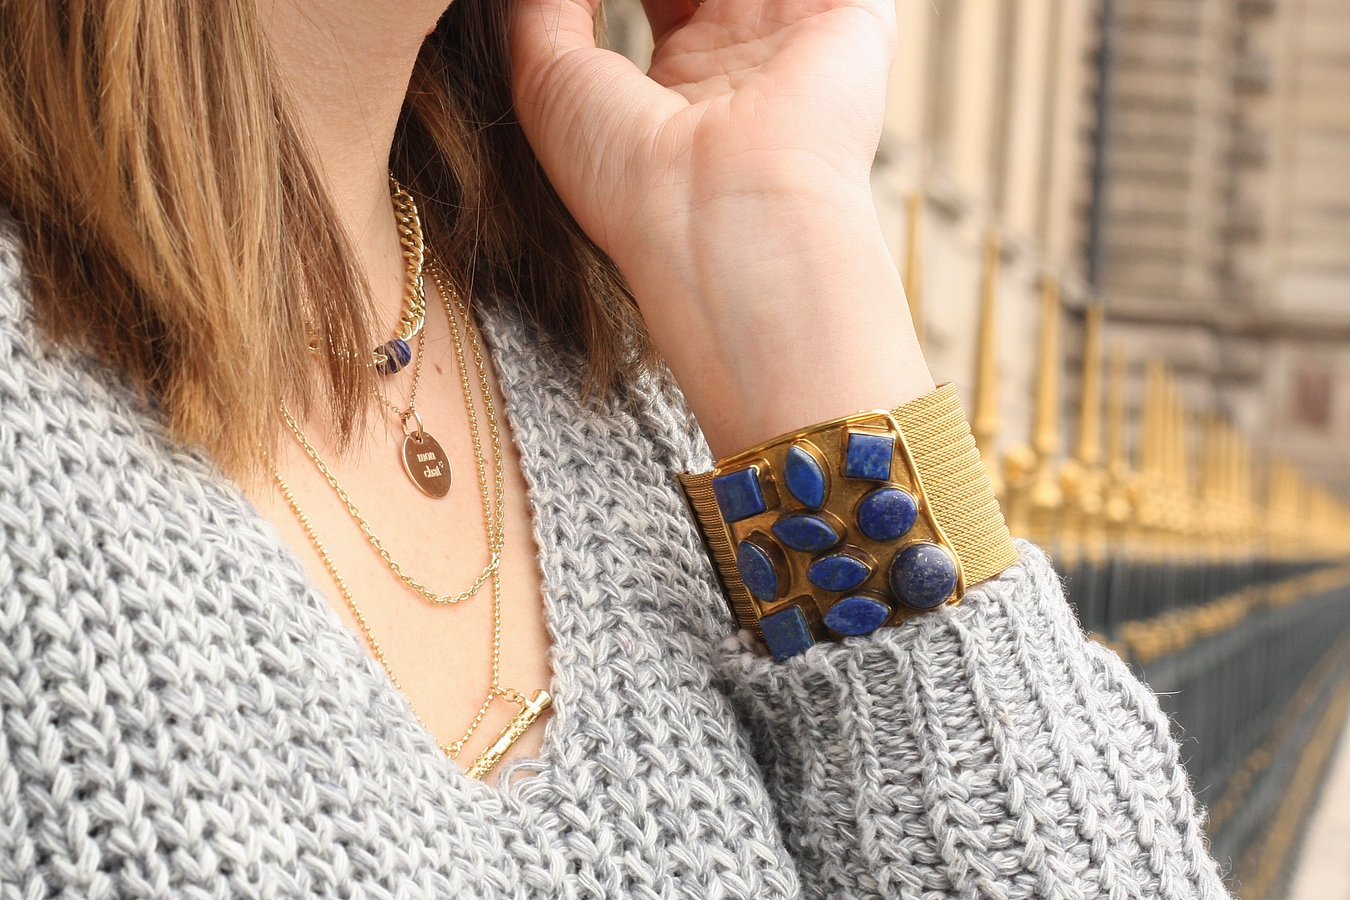 Blog mode femme Paris - Du style, Madame - Streetstyle - manchette - bijoux - oggi